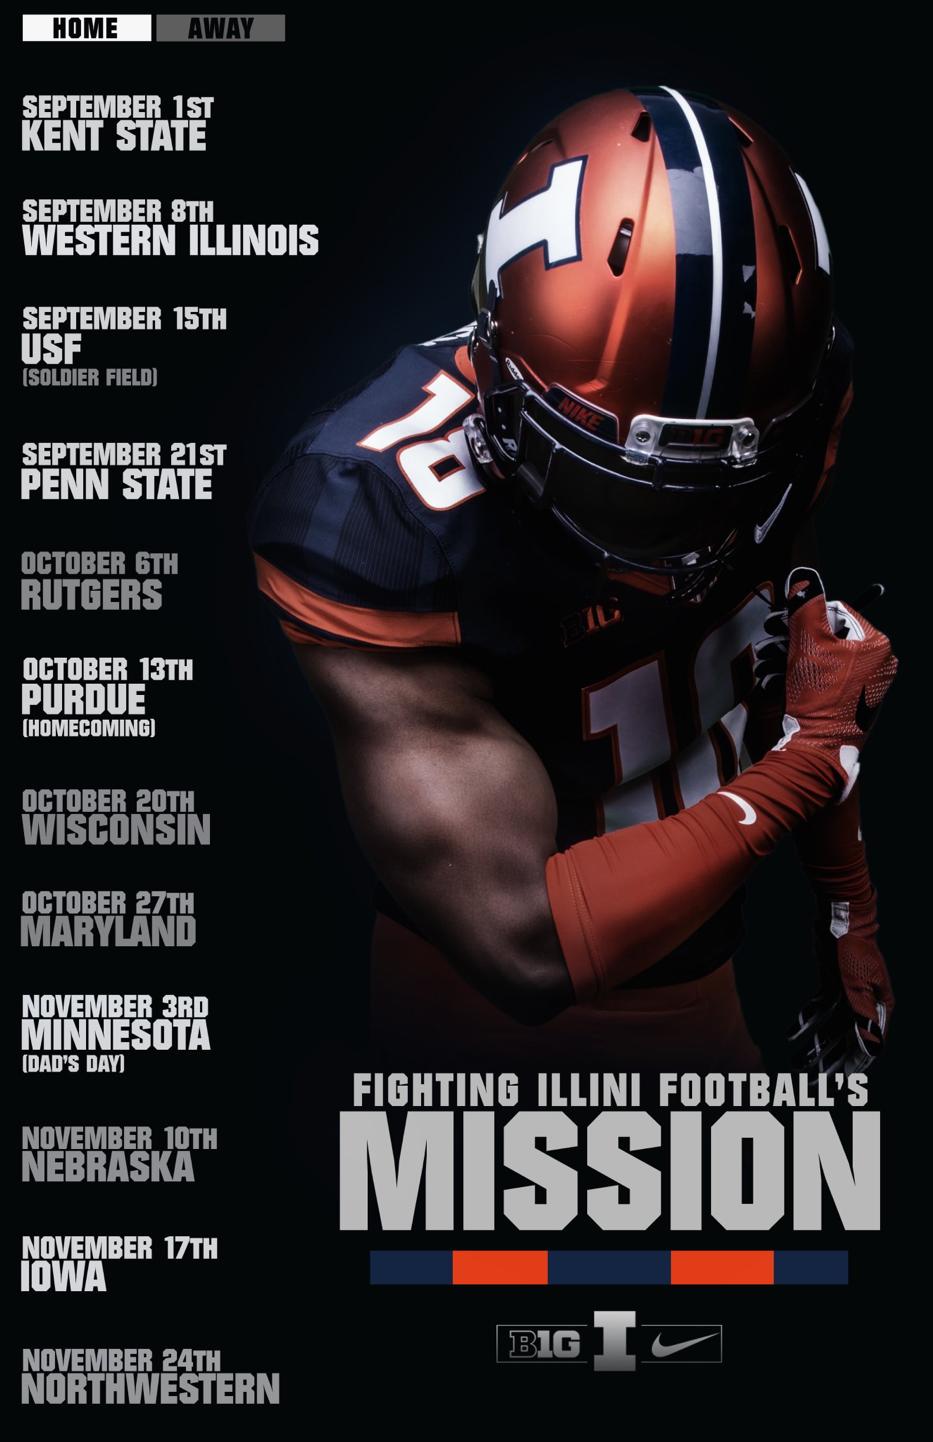 Illinois Fighting Illini Football Sports Graphic Design Sports Pictures